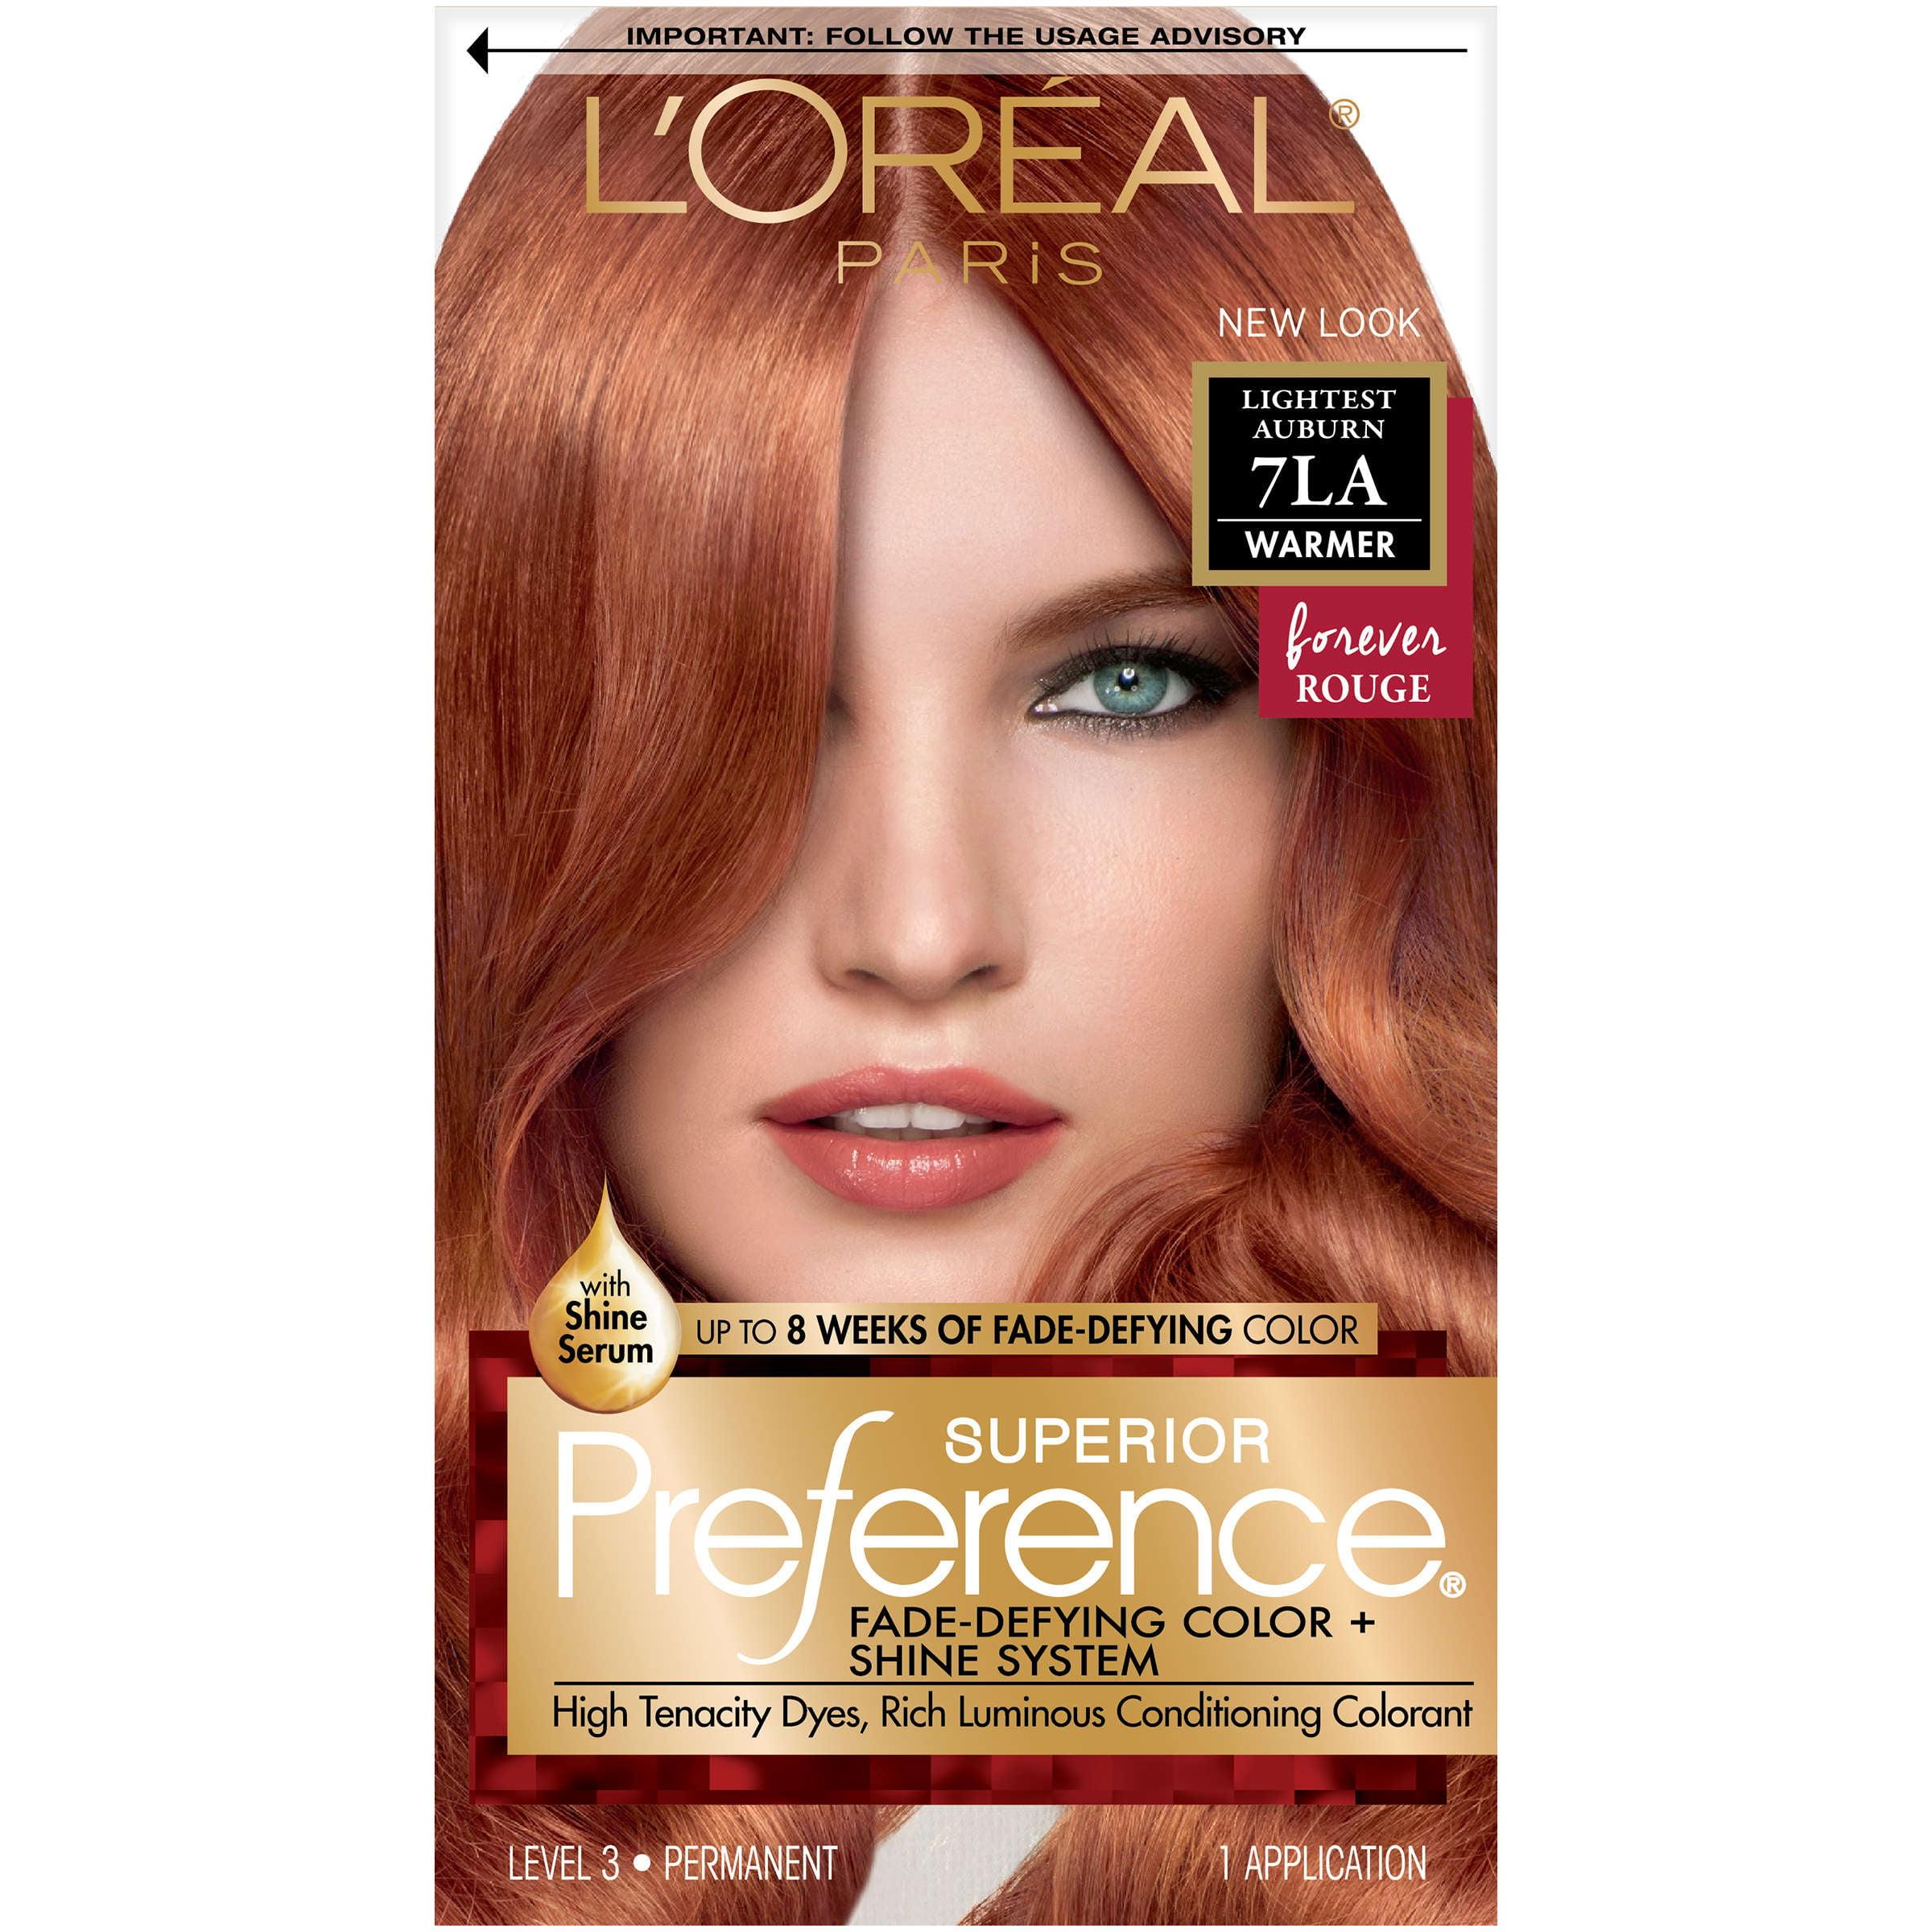 L'Oreal Paris Superior Preference Fade-Defying Color + Shine Hair Color, 7LA Lightest Auburn, 1 Kit